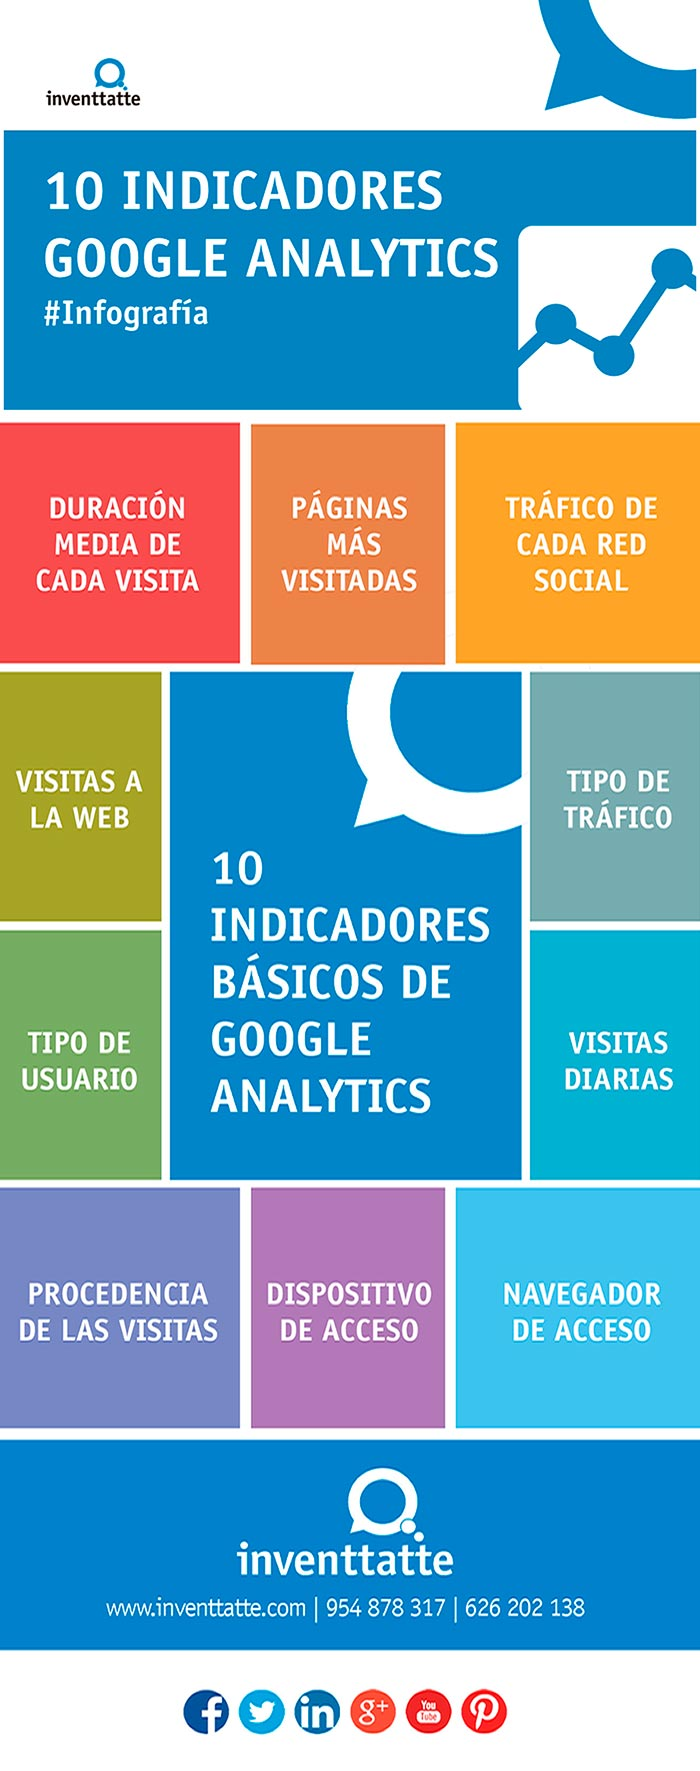 Infografia sobre indicadores de Google Analytics